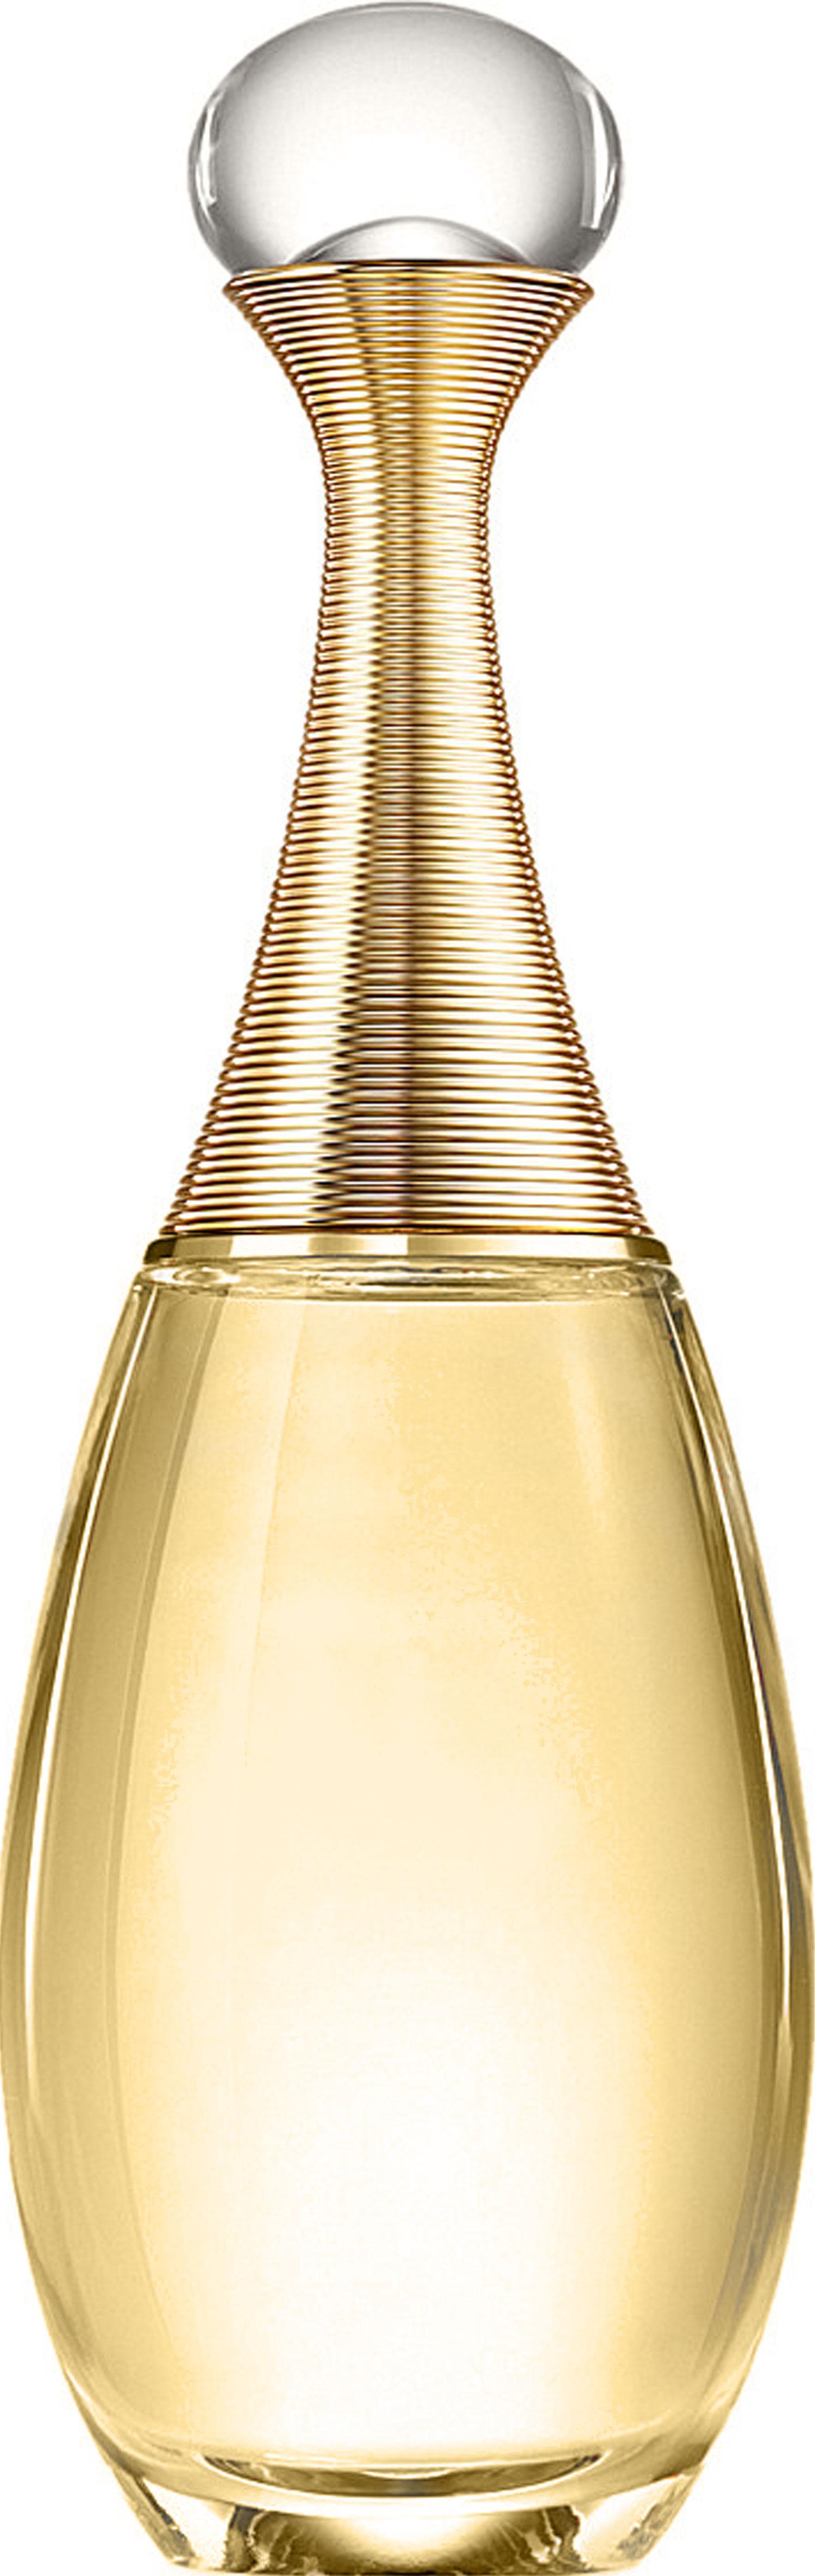 Christian Dior Jadore гель для душа 200мл (Кристиан Диор Жадор)